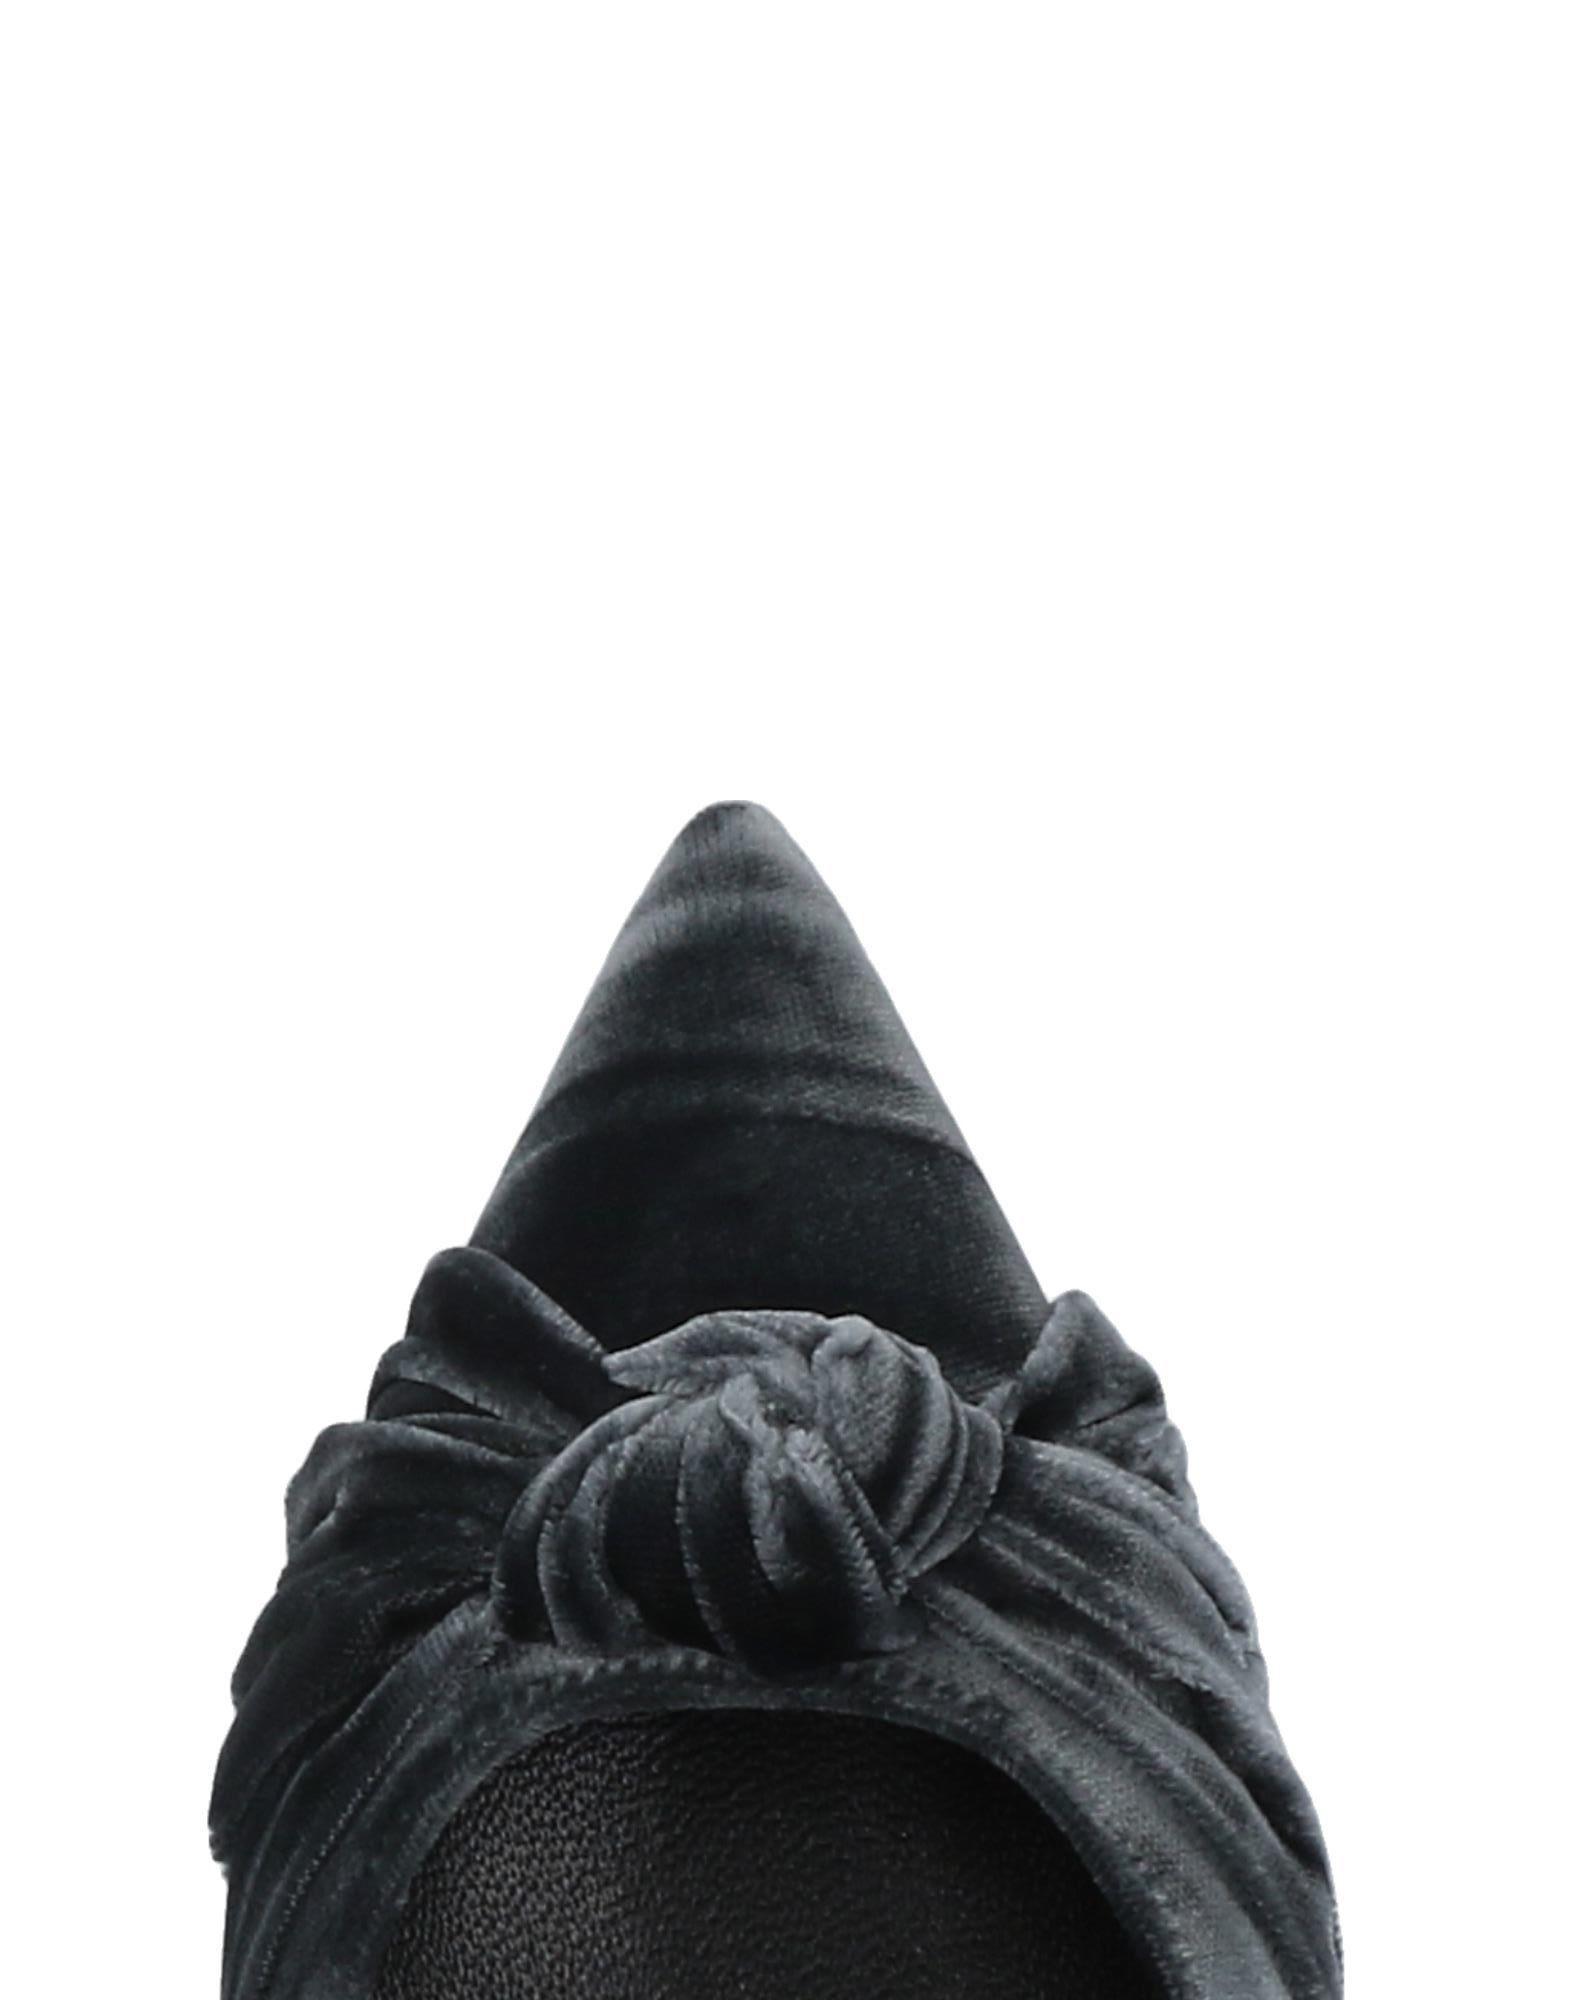 Deimille Pumps Damen  11485533OU Gute Qualität beliebte beliebte beliebte Schuhe f863eb